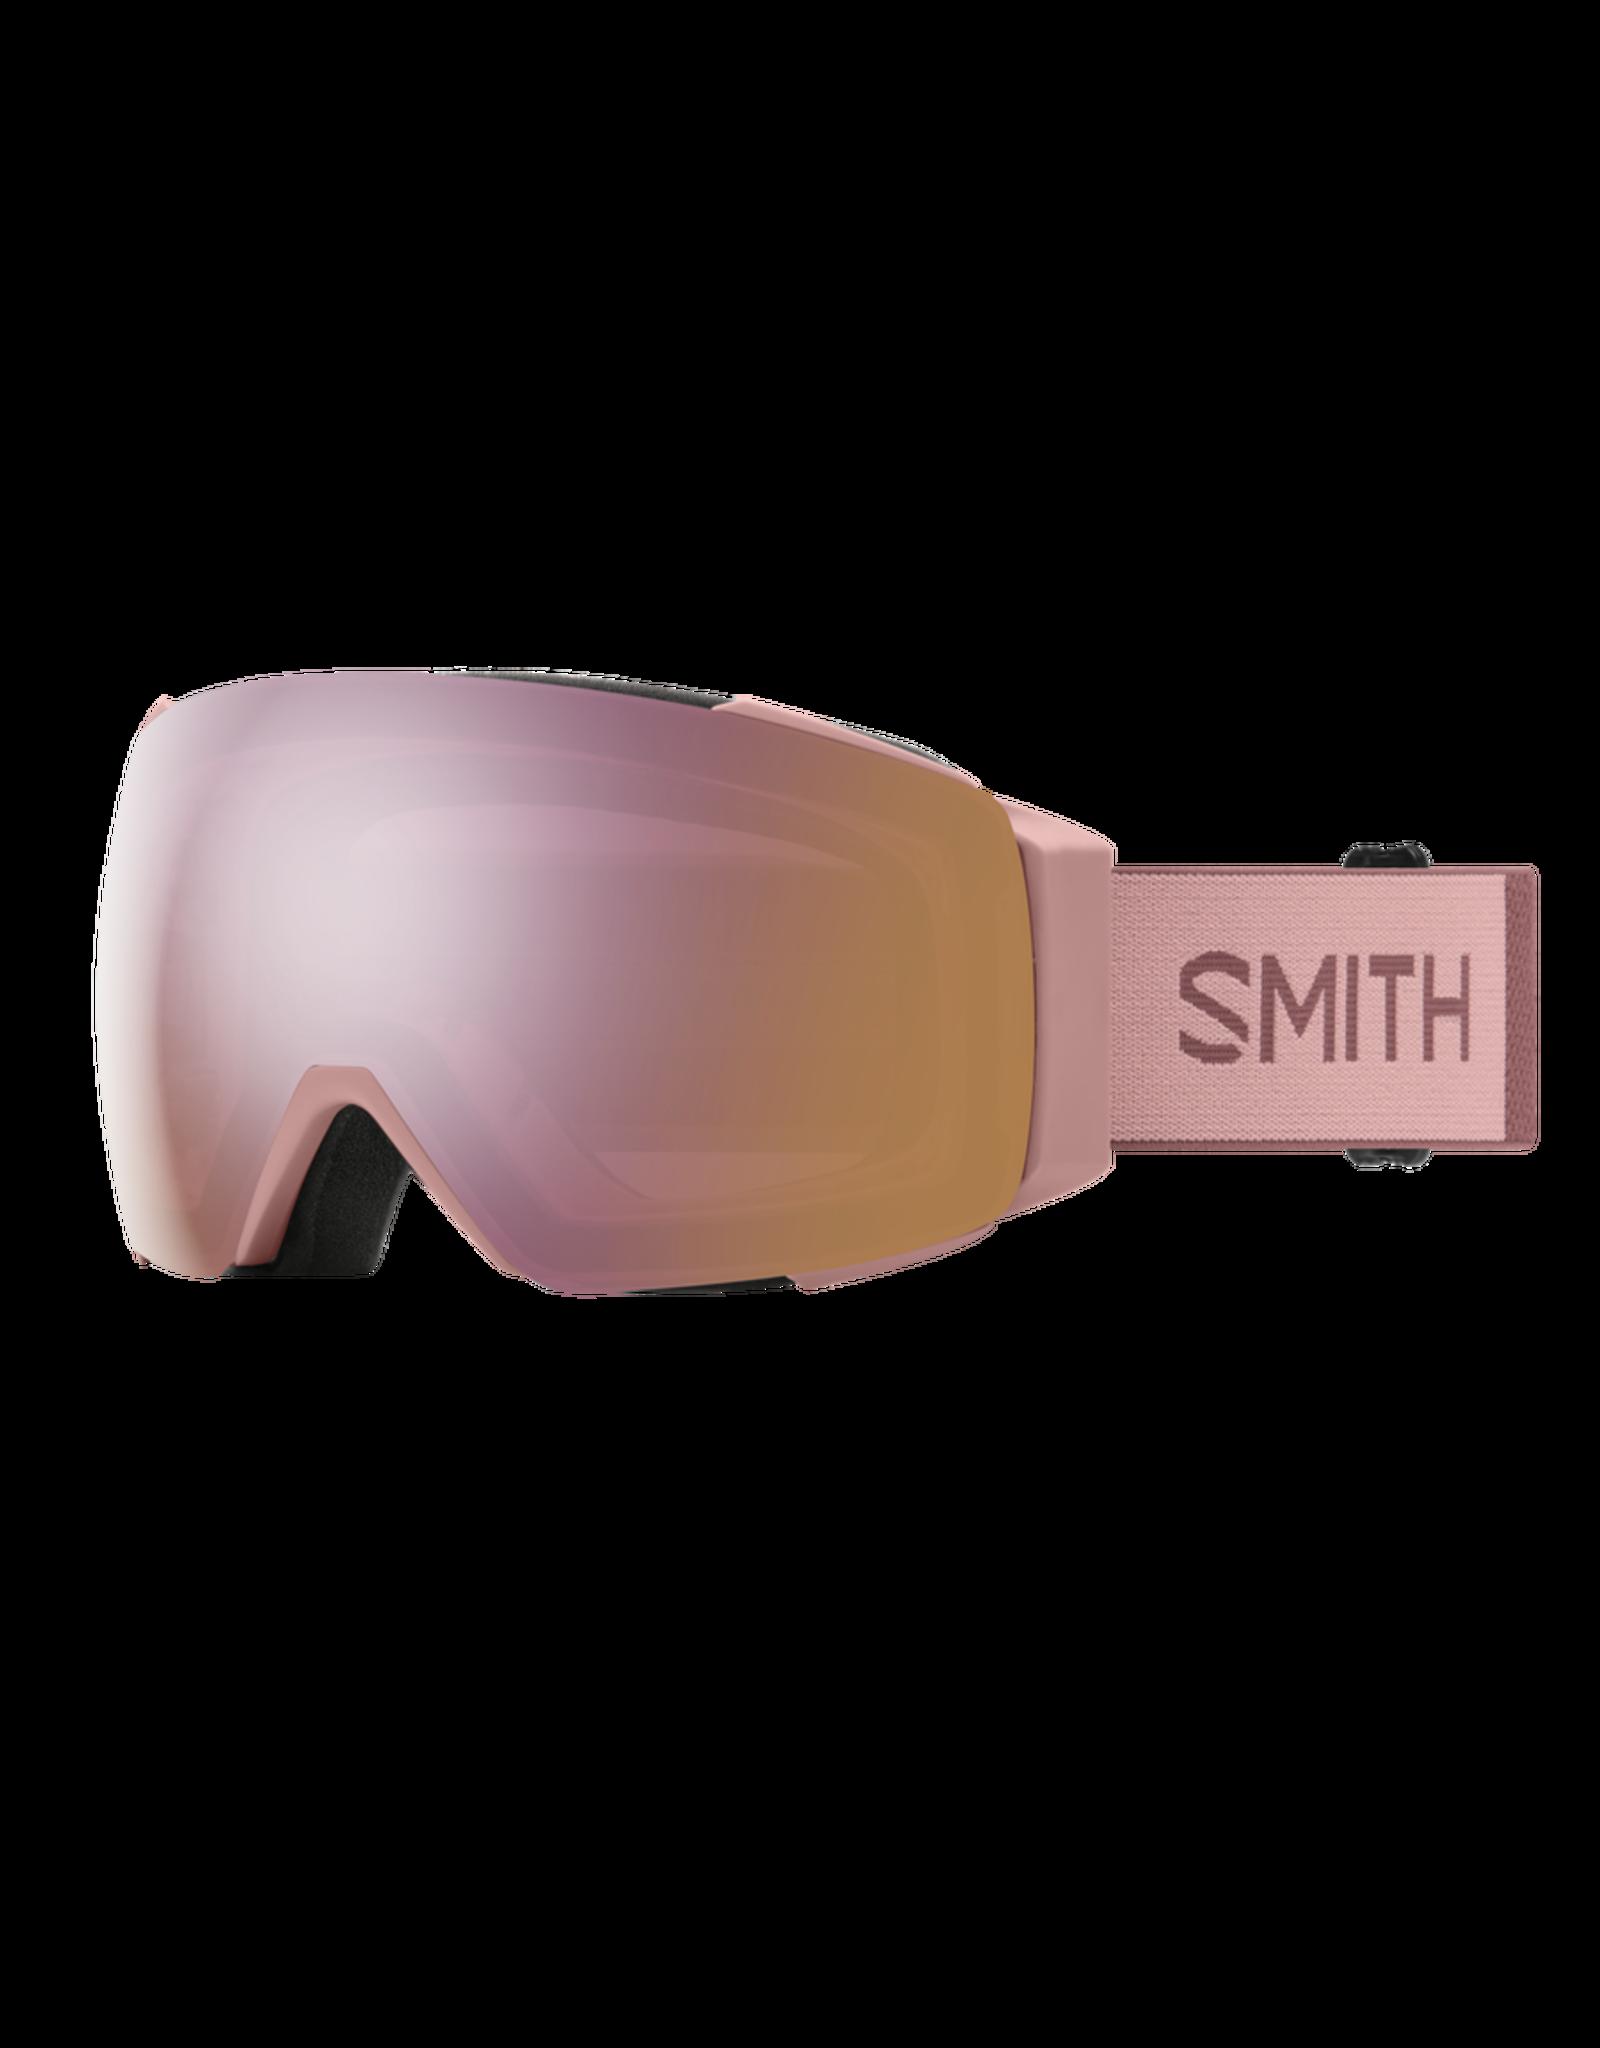 SMITH I/O MAG Rock Salt Tannin w/Chromapop Rose Gold and Storm Rose Flash